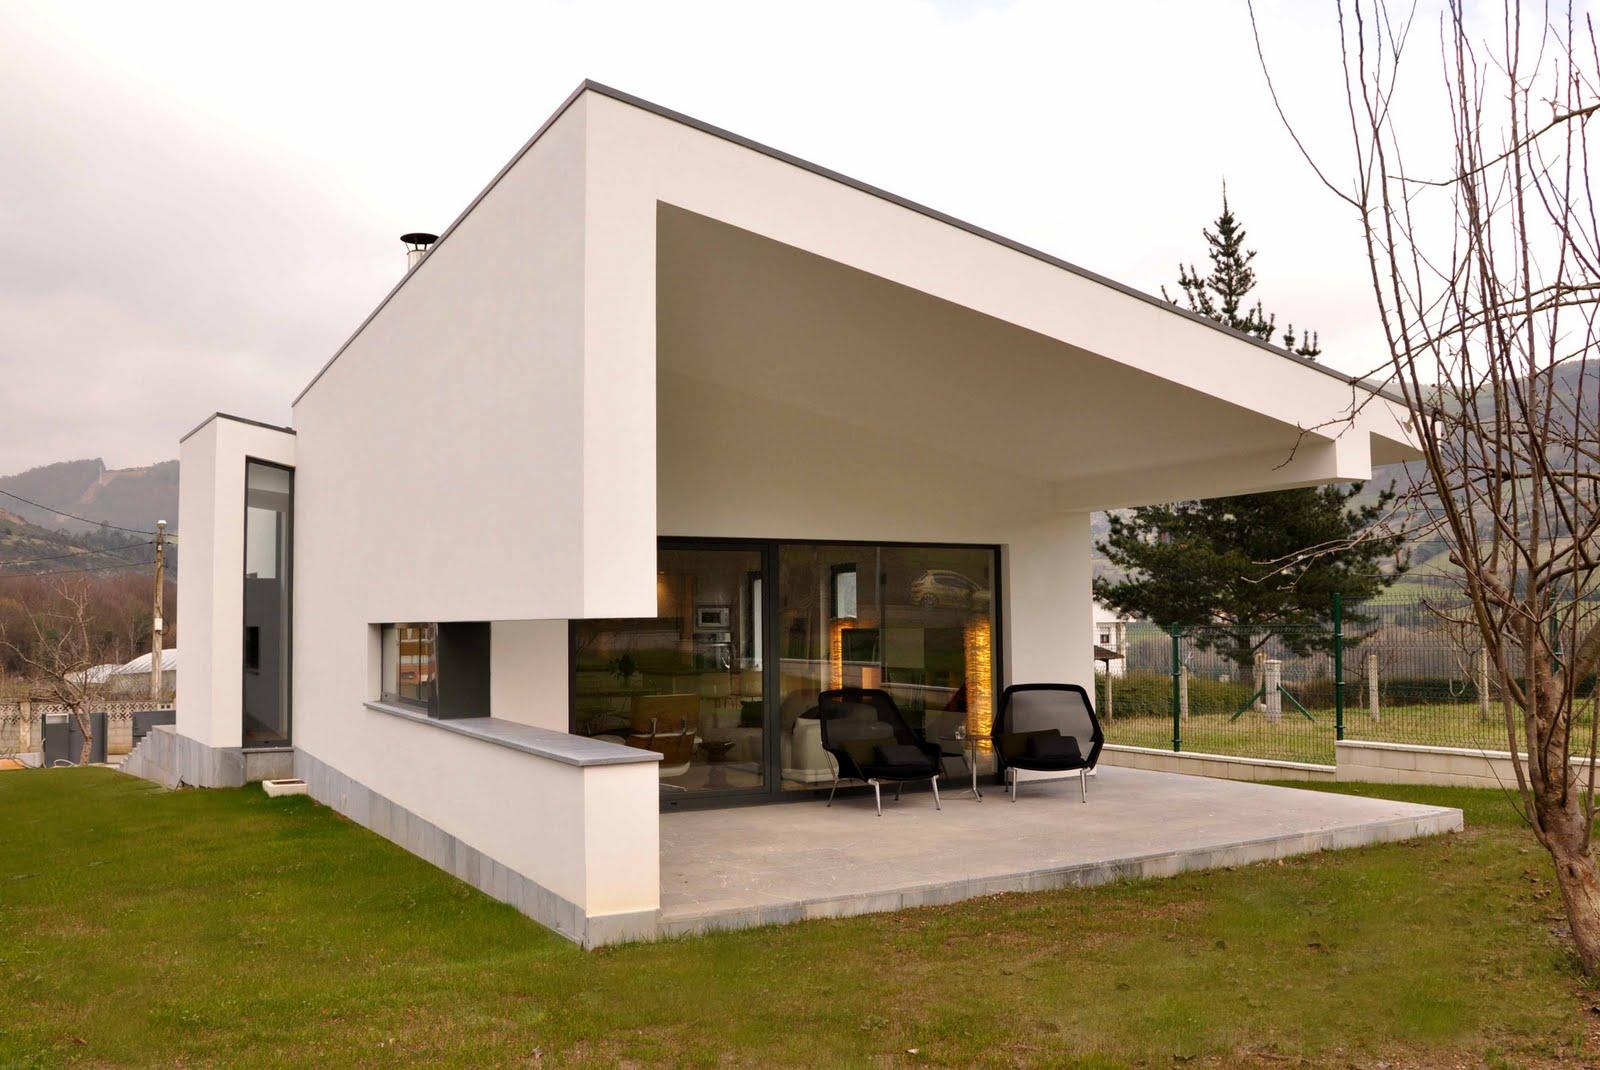 Arquitectura arquidea vivienda unifamiliar en sandiche for Casa minimalistas